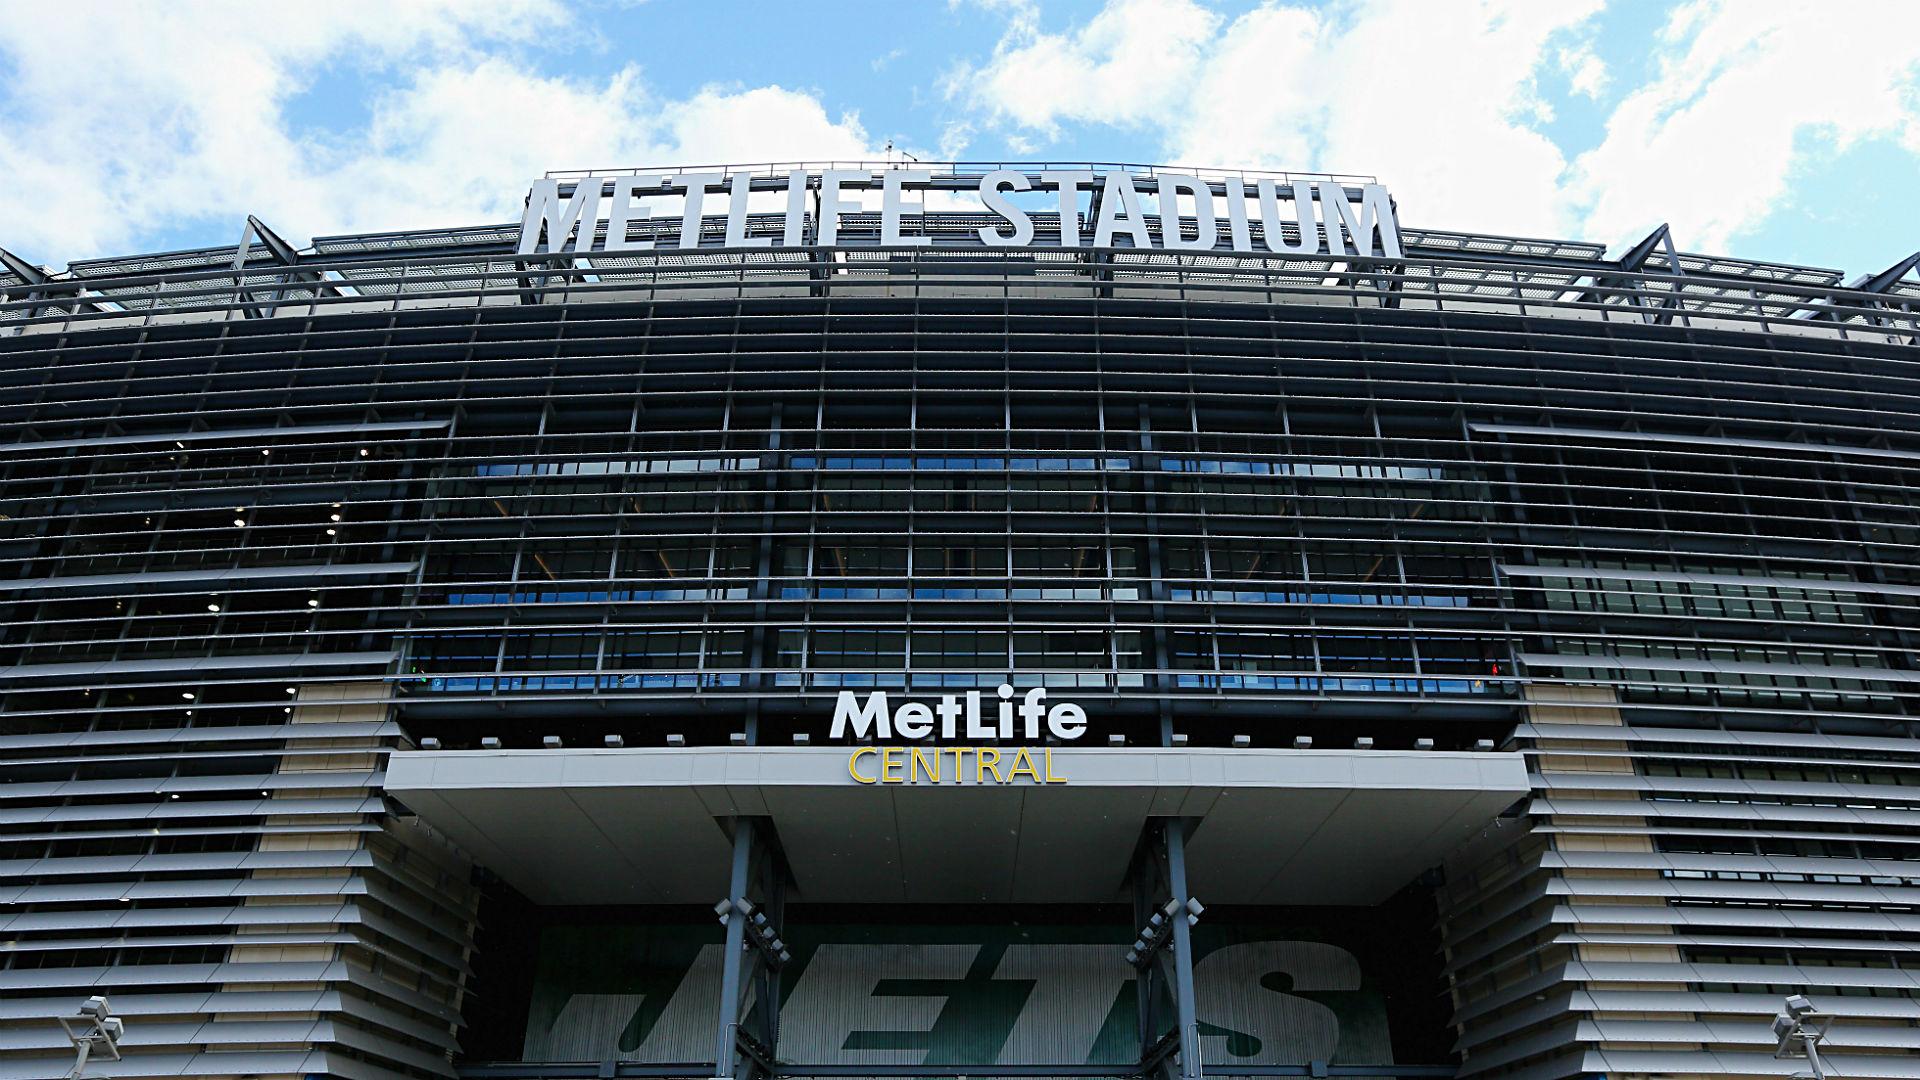 Metlife Stadium Usnews Getty